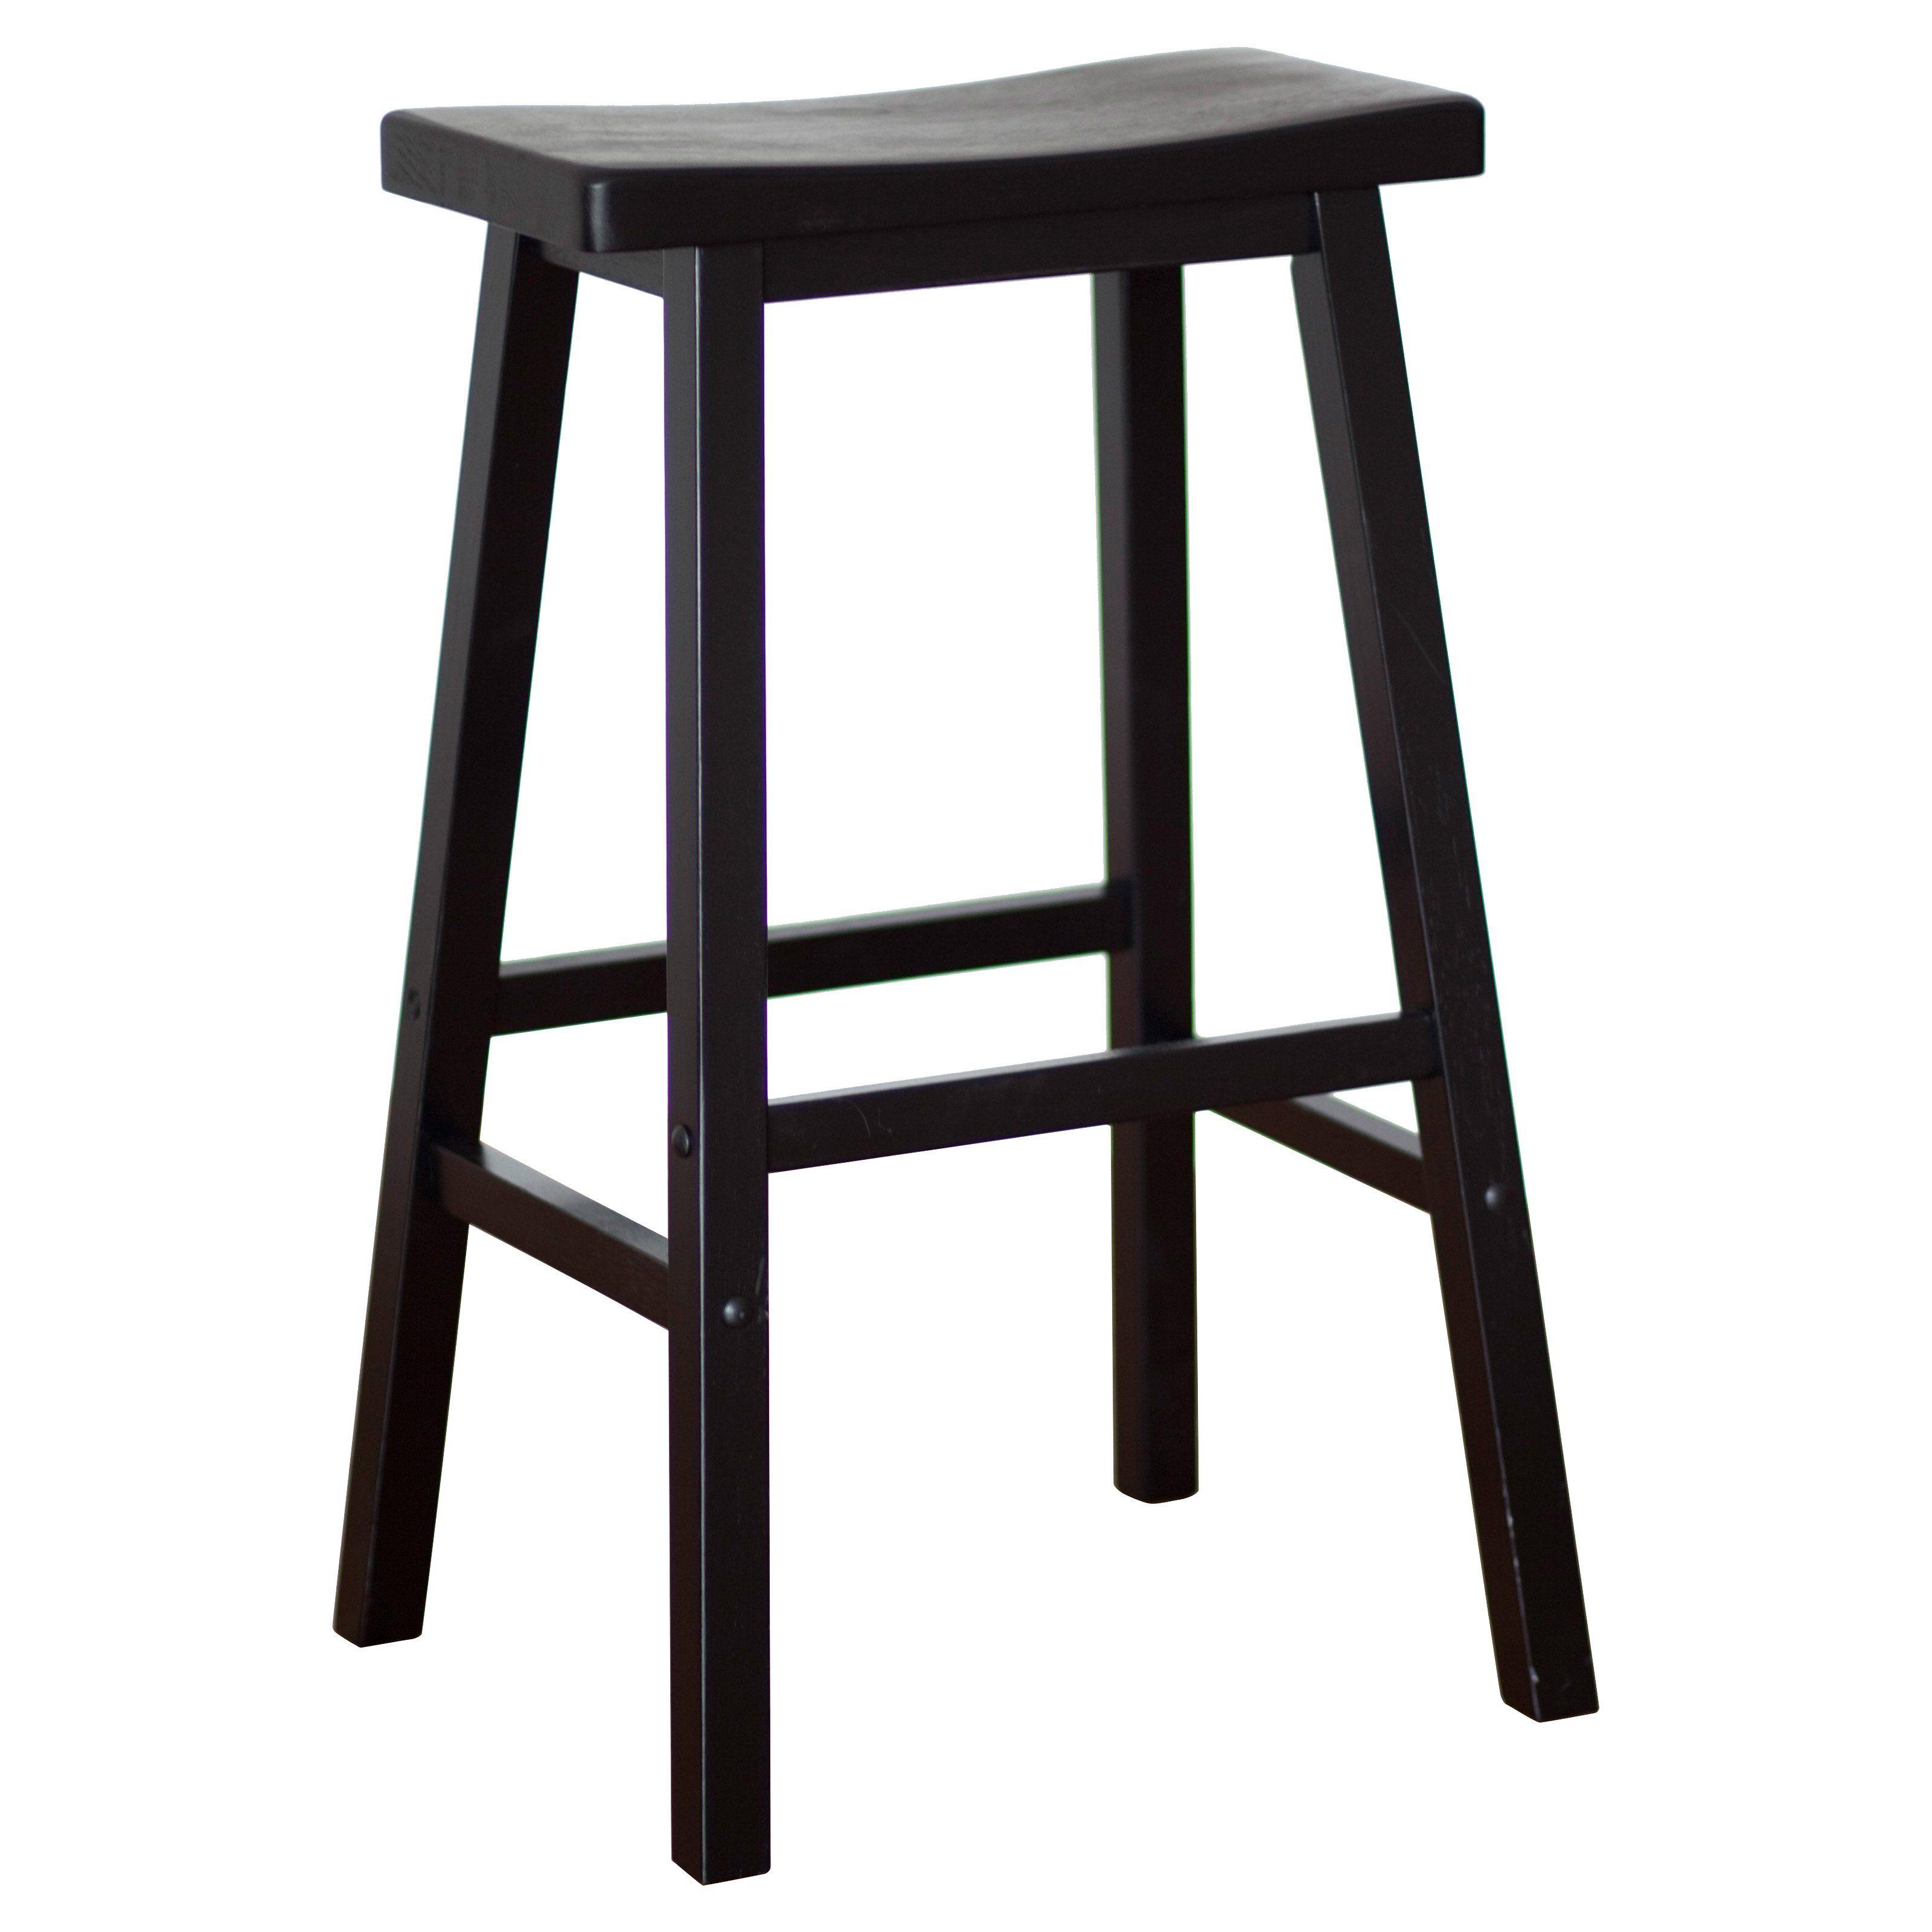 Have To Have It Winsome Wood 29 Inch Rta Single Saddle Seat Bar Stool Black 36 98 Hayneedle Com Bar Stools Wood Bar Stools Wooden Bar Stools [ 3200 x 3200 Pixel ]